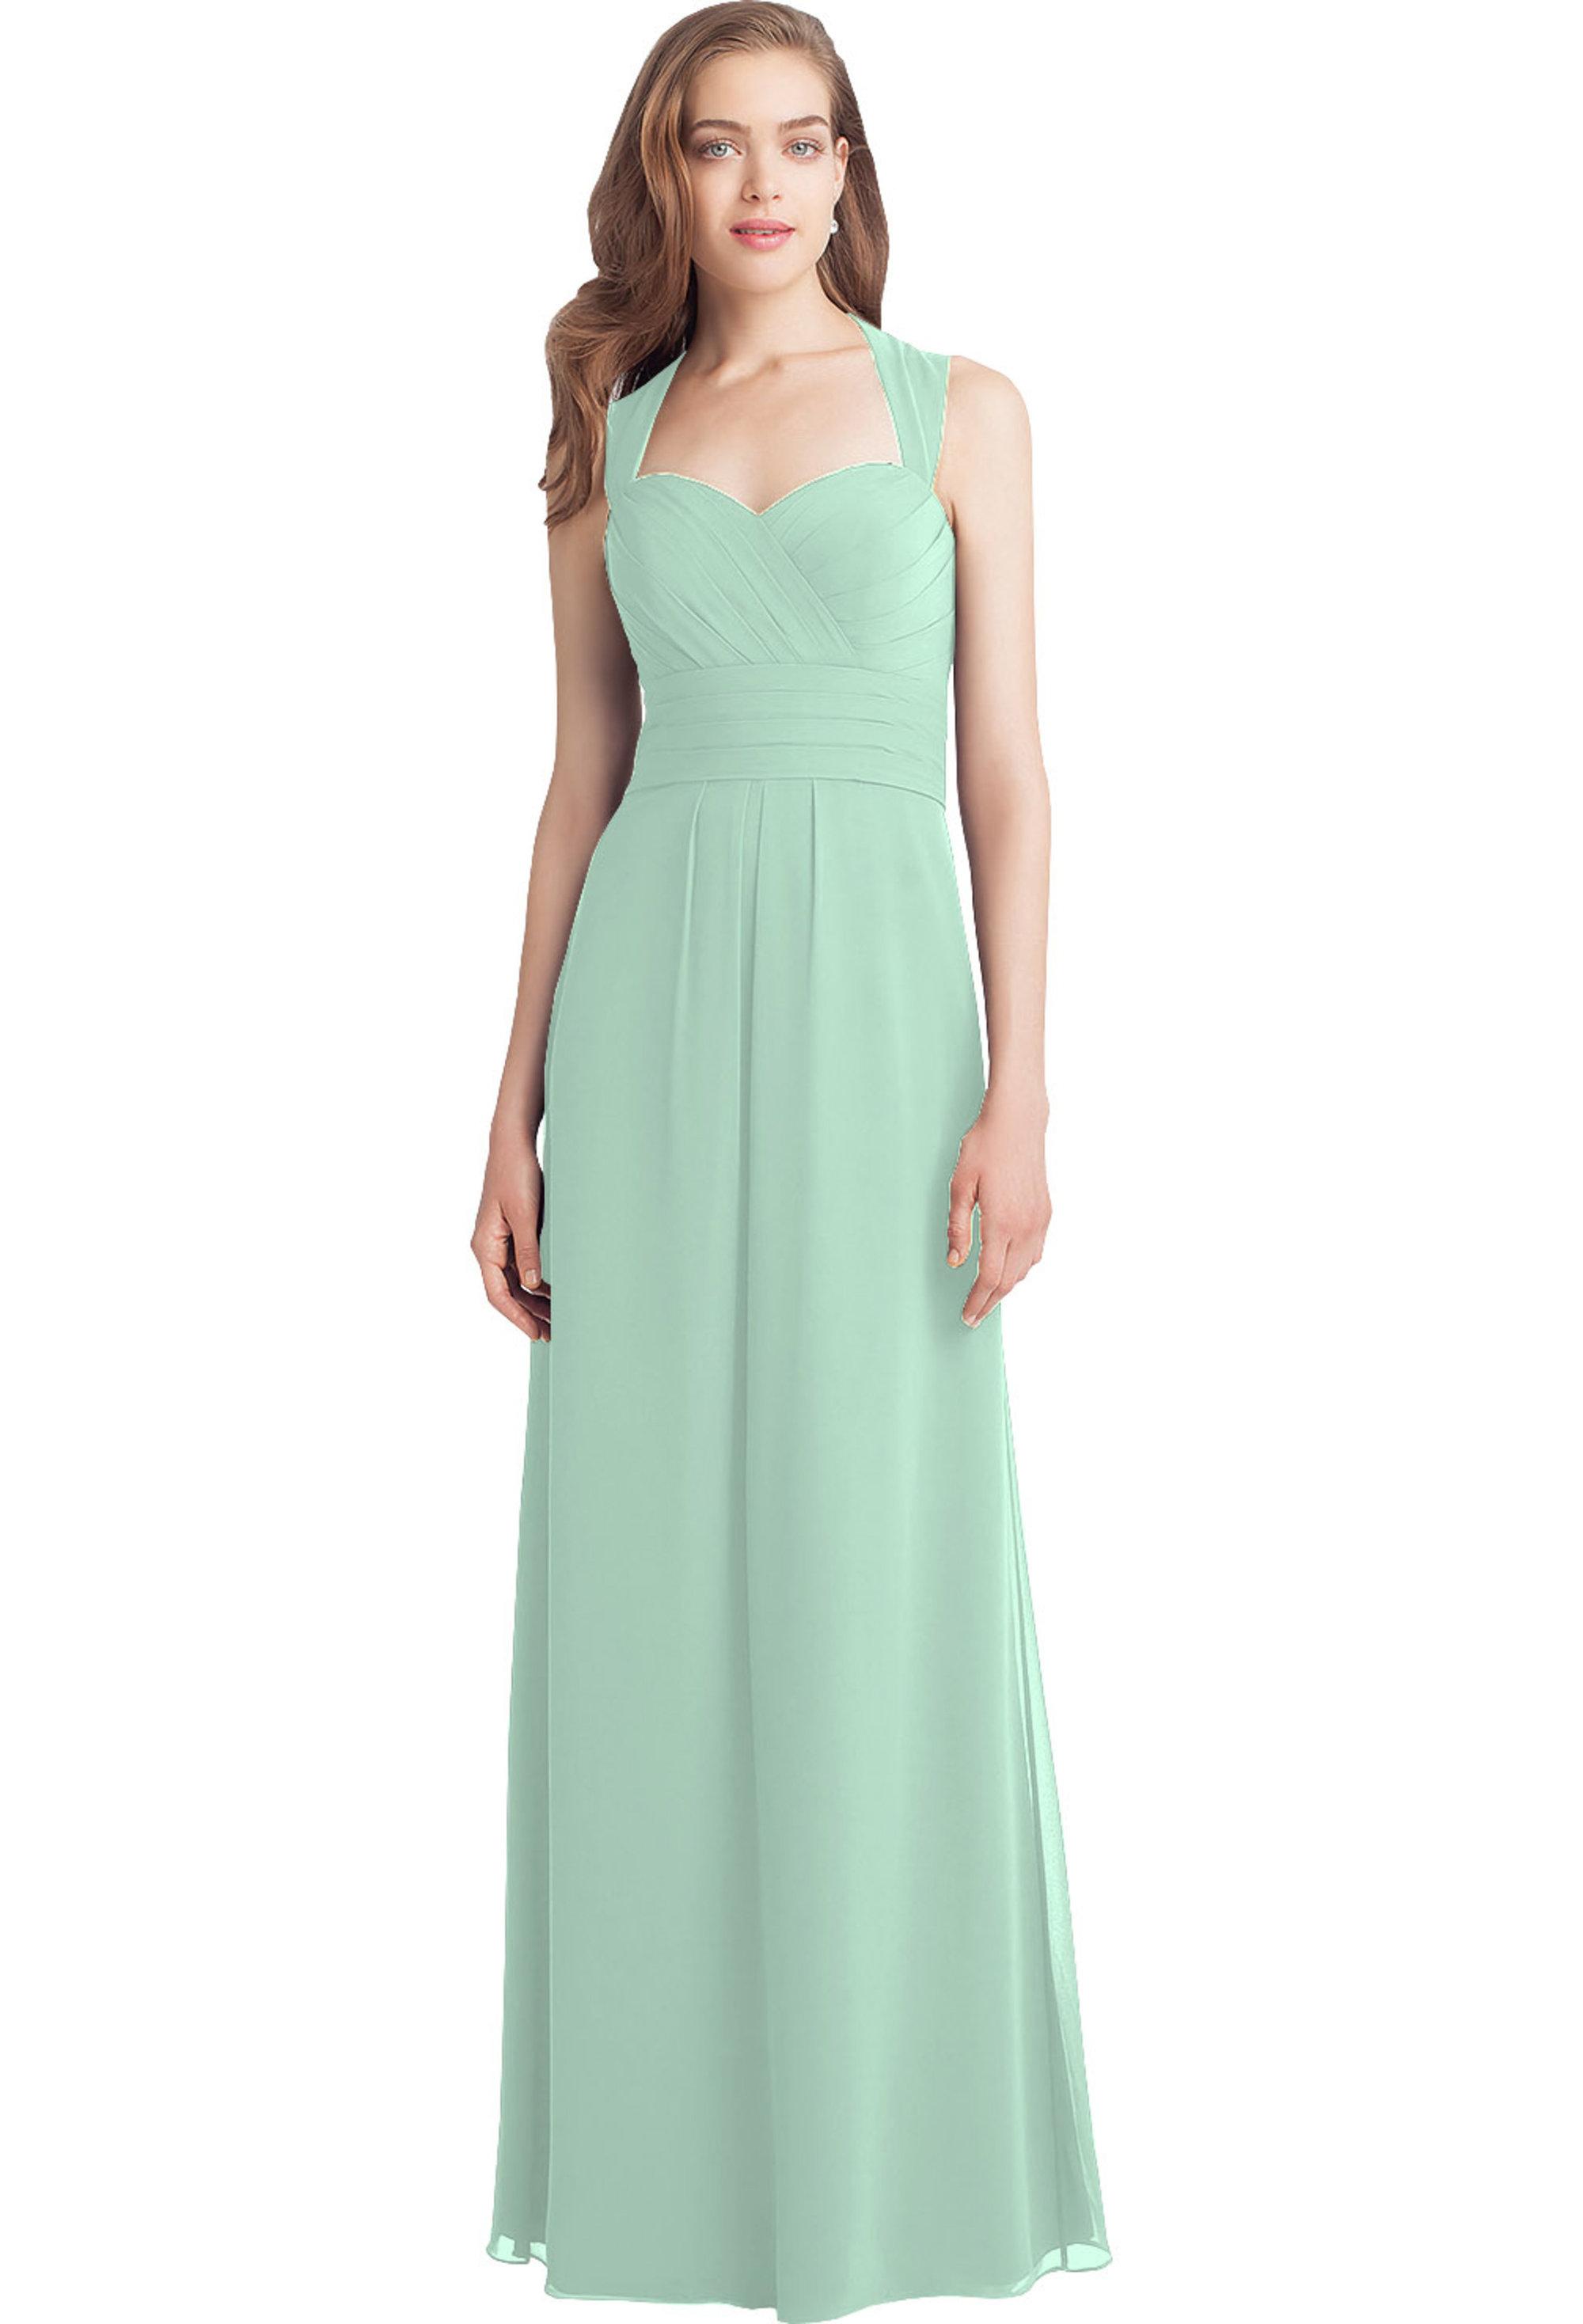 Bill Levkoff MINT Chiffon Sweetheart A-line gown, $210.00 Front